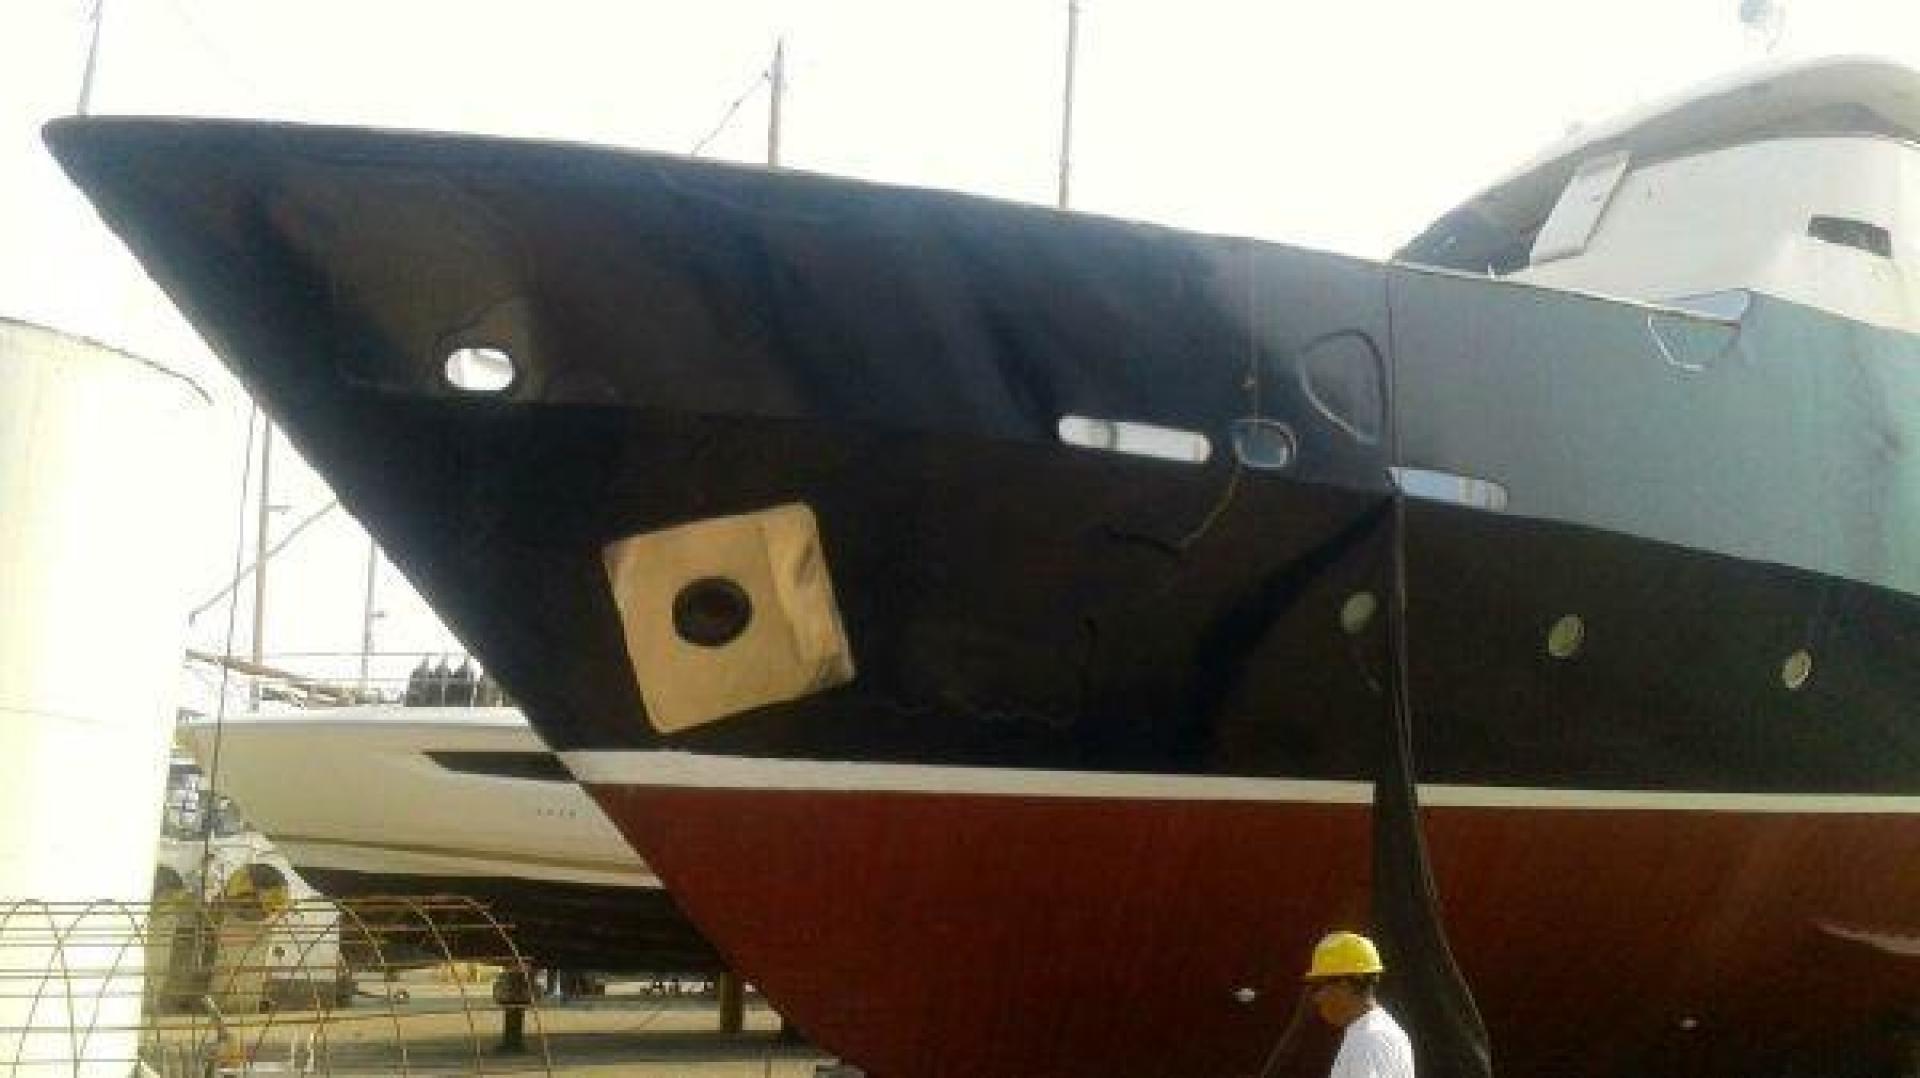 Custom-Anastasiades & Tso 1982-Star Alliance Salvador De Bahia-Brazil-1566474 | Thumbnail